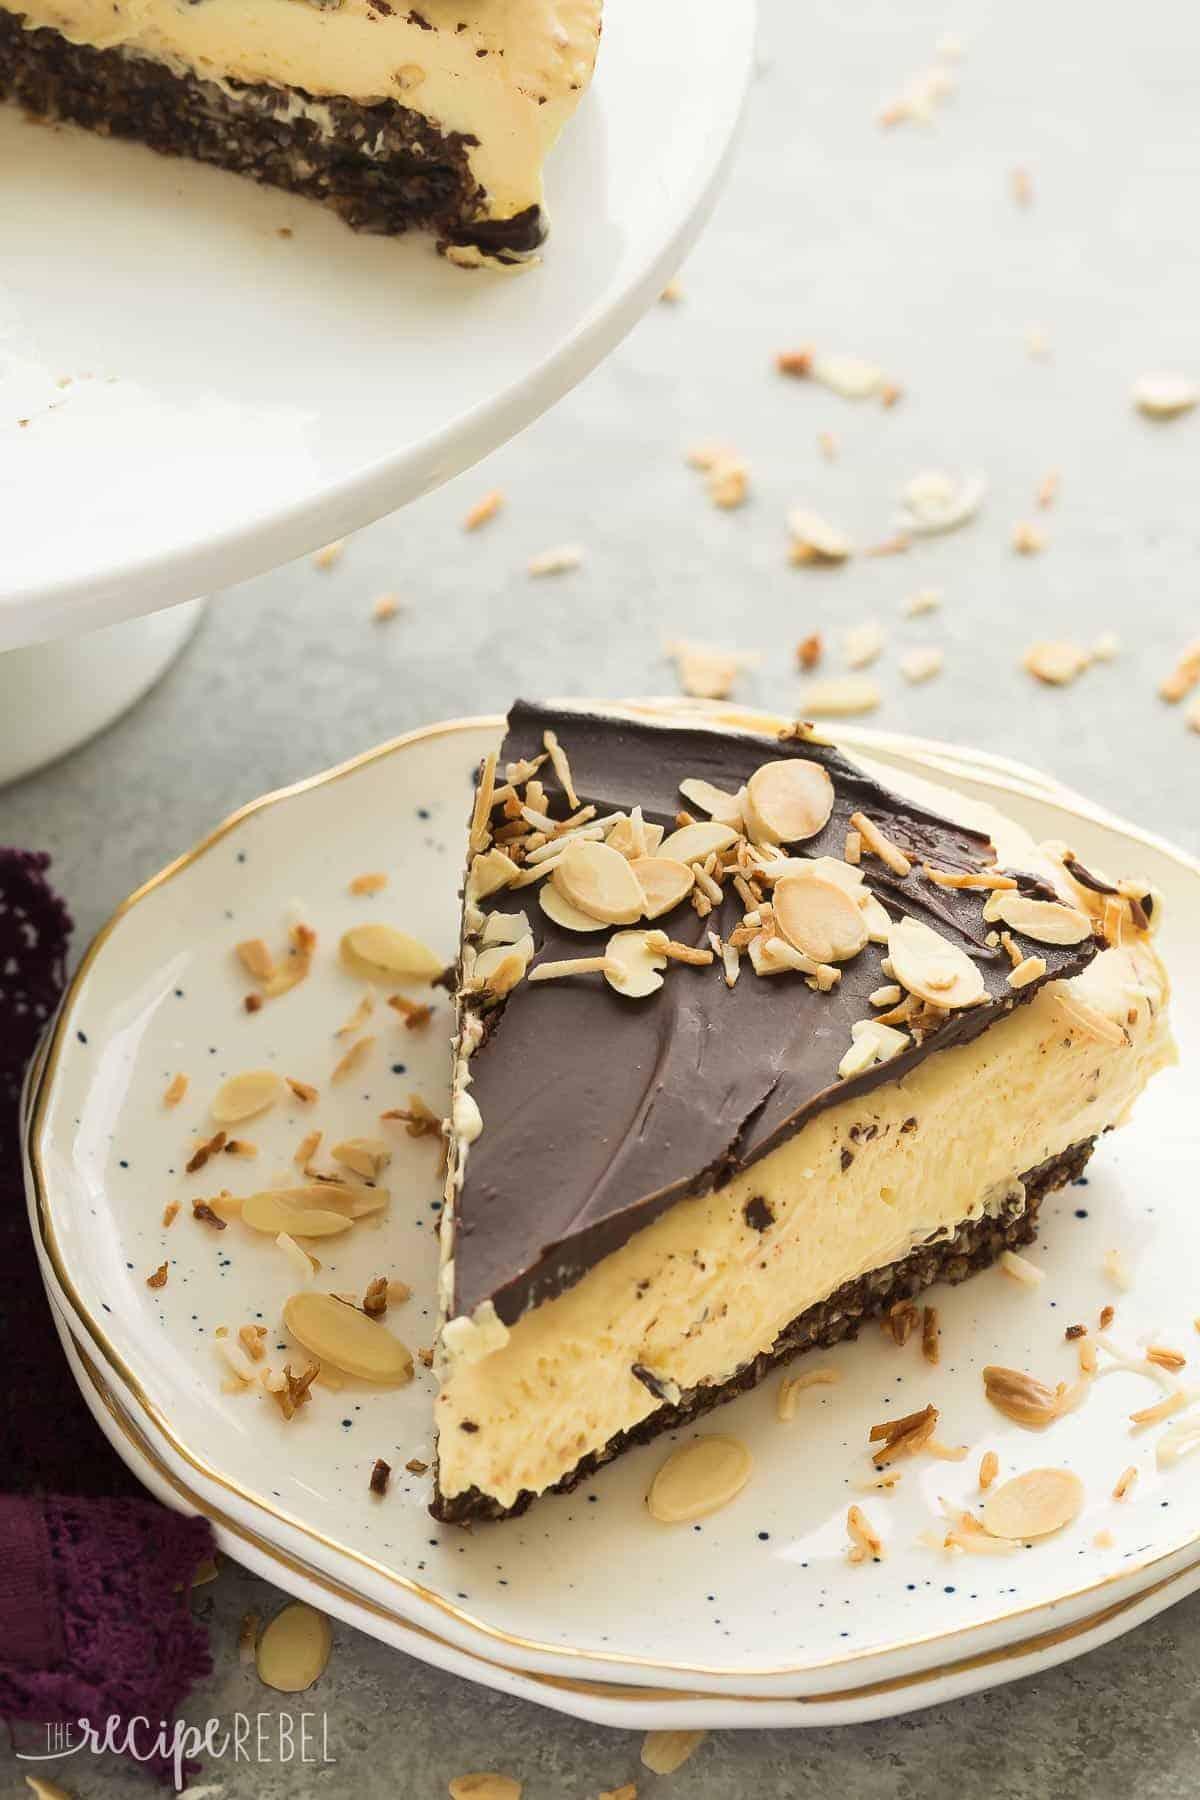 No bake nanaimo bar cheesecake